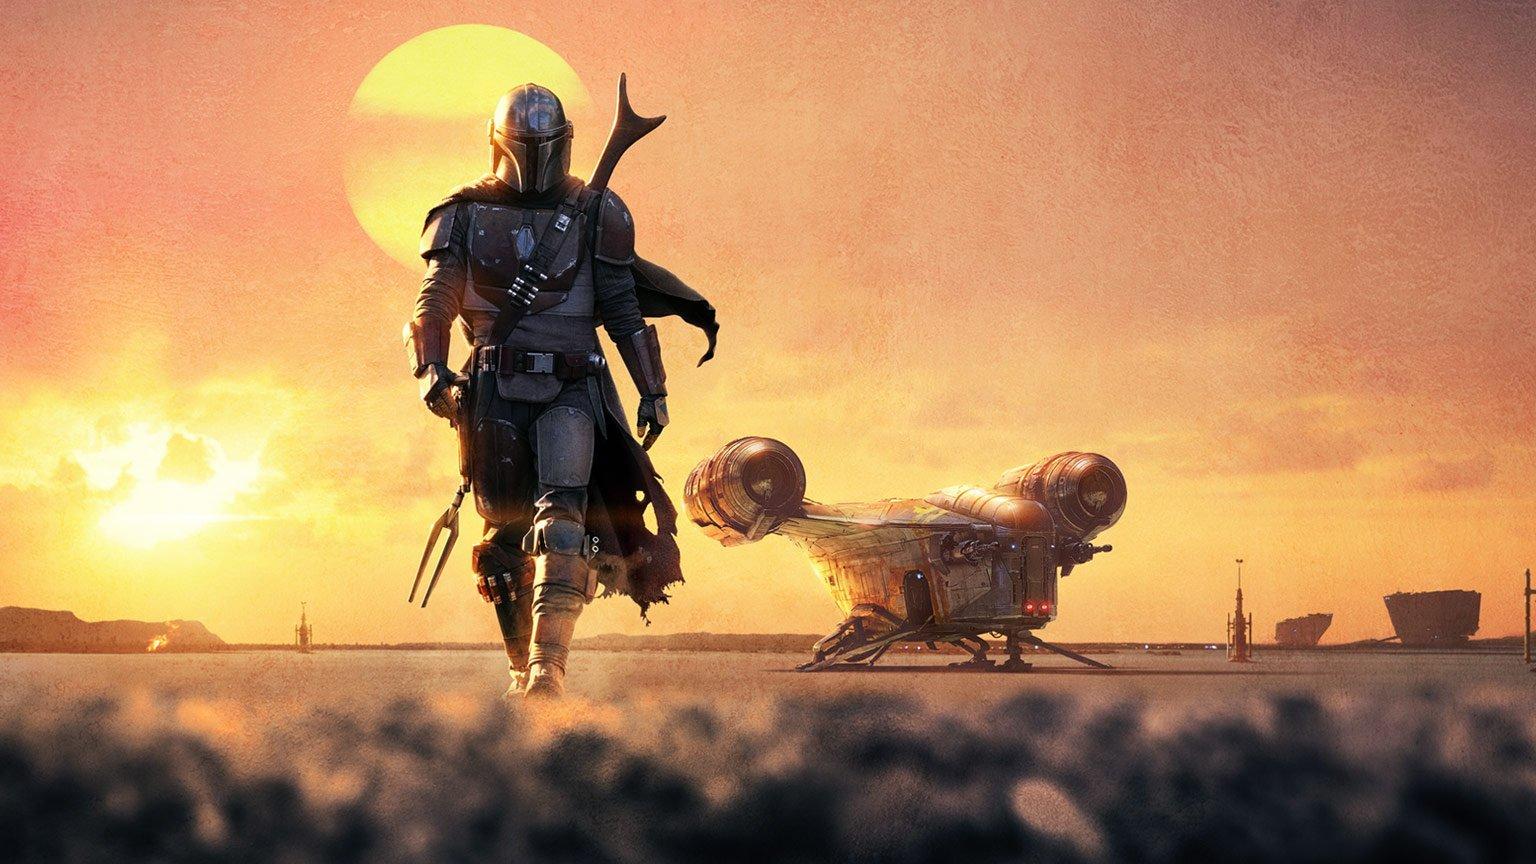 Mandalorian strides away from his ship